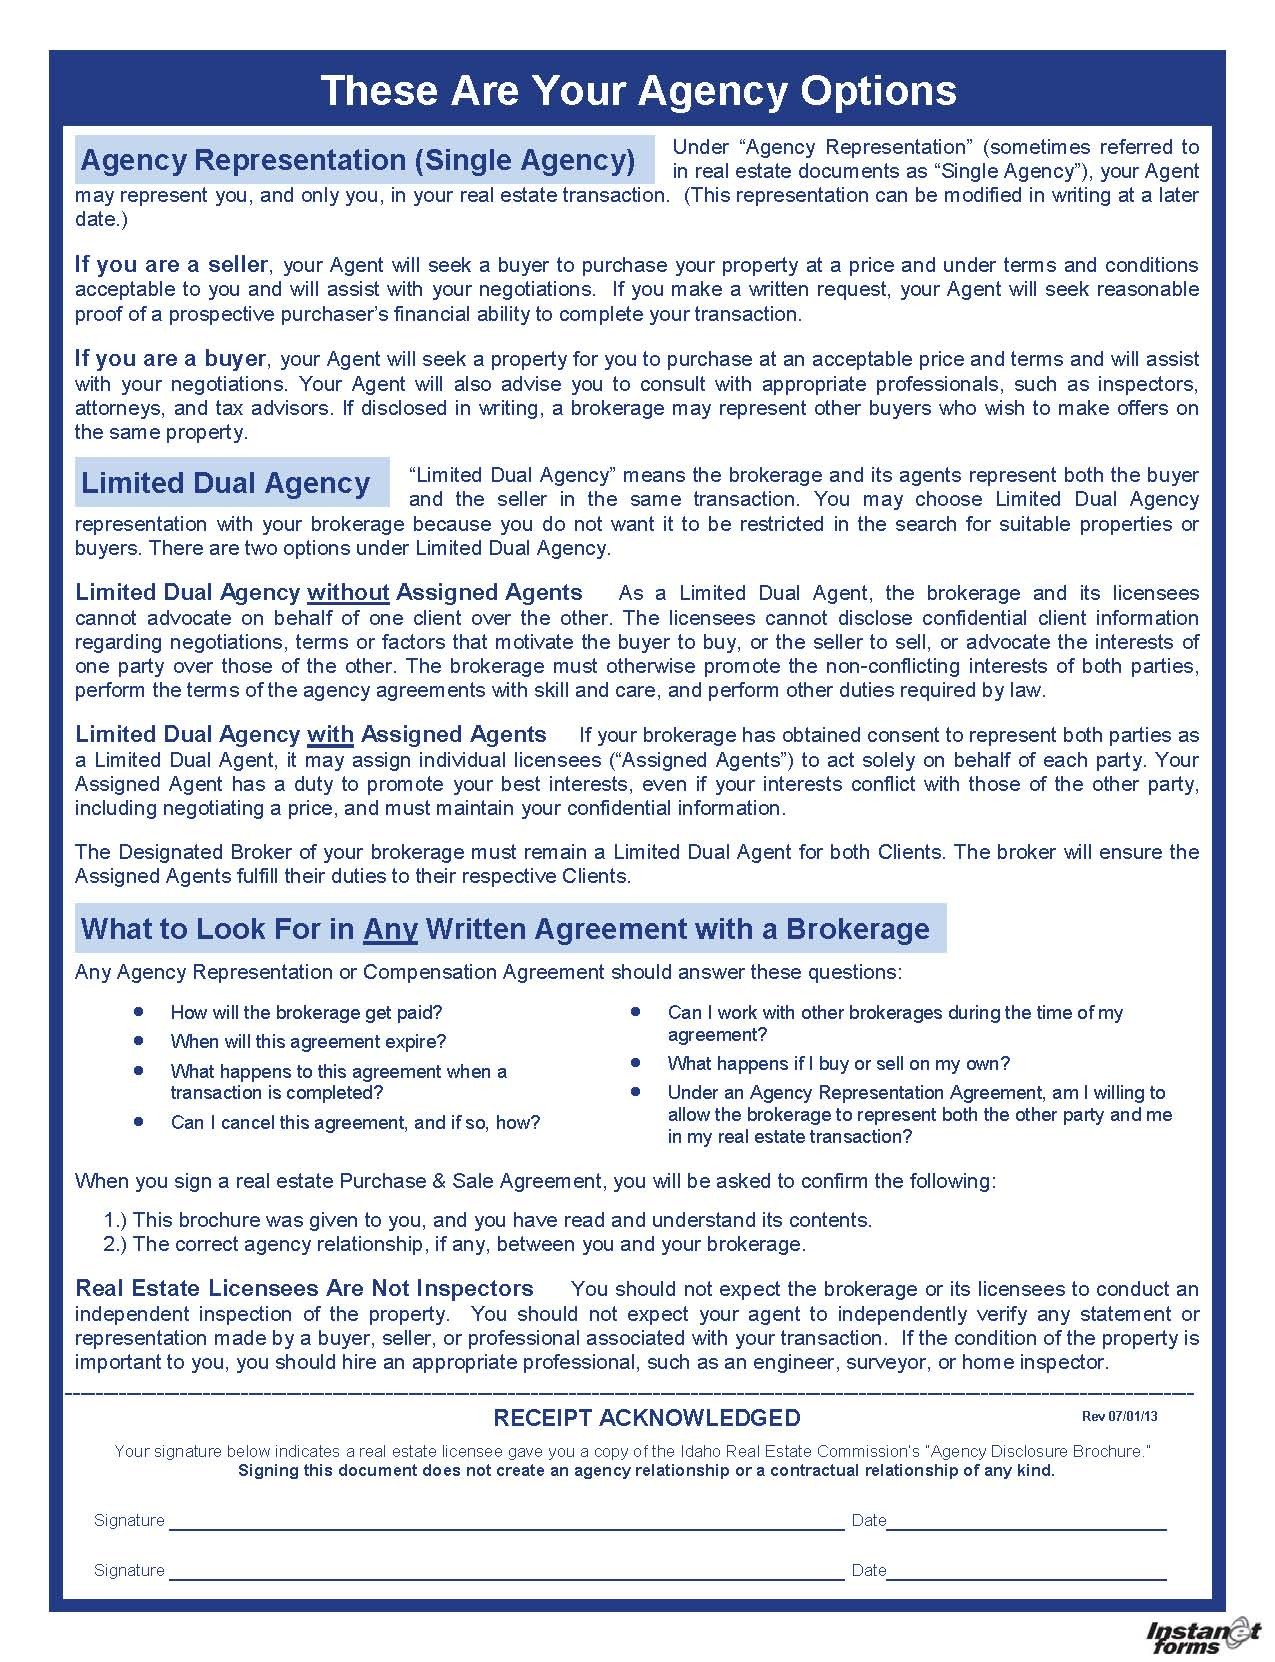 Idaho Real Estate Agency Brochure P1_Page_2